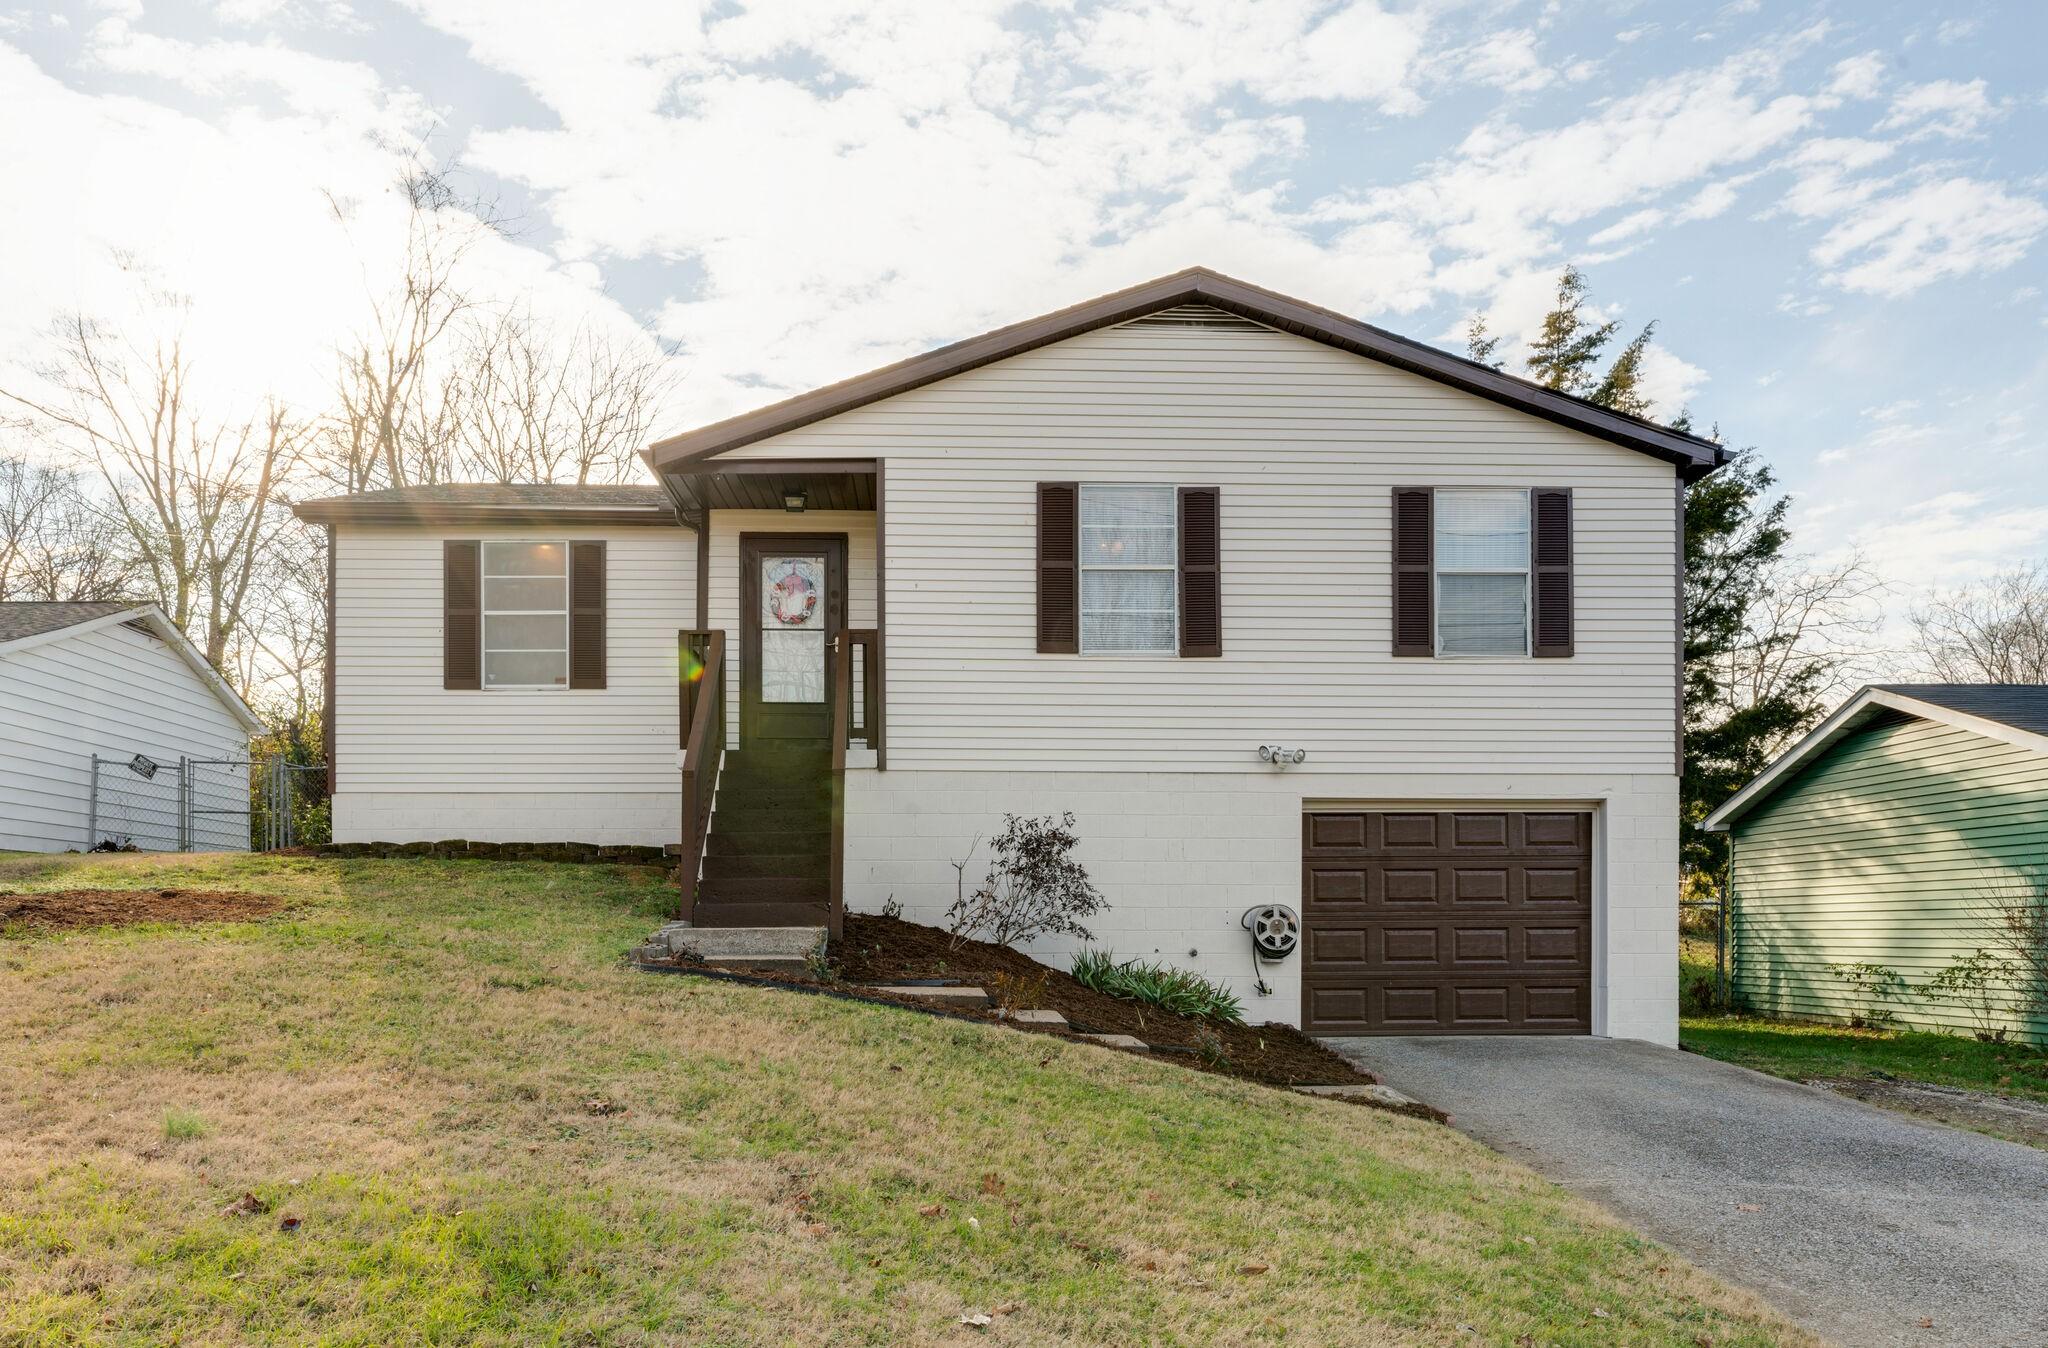 1032 Cheyenne Blvd Property Photo - Madison, TN real estate listing